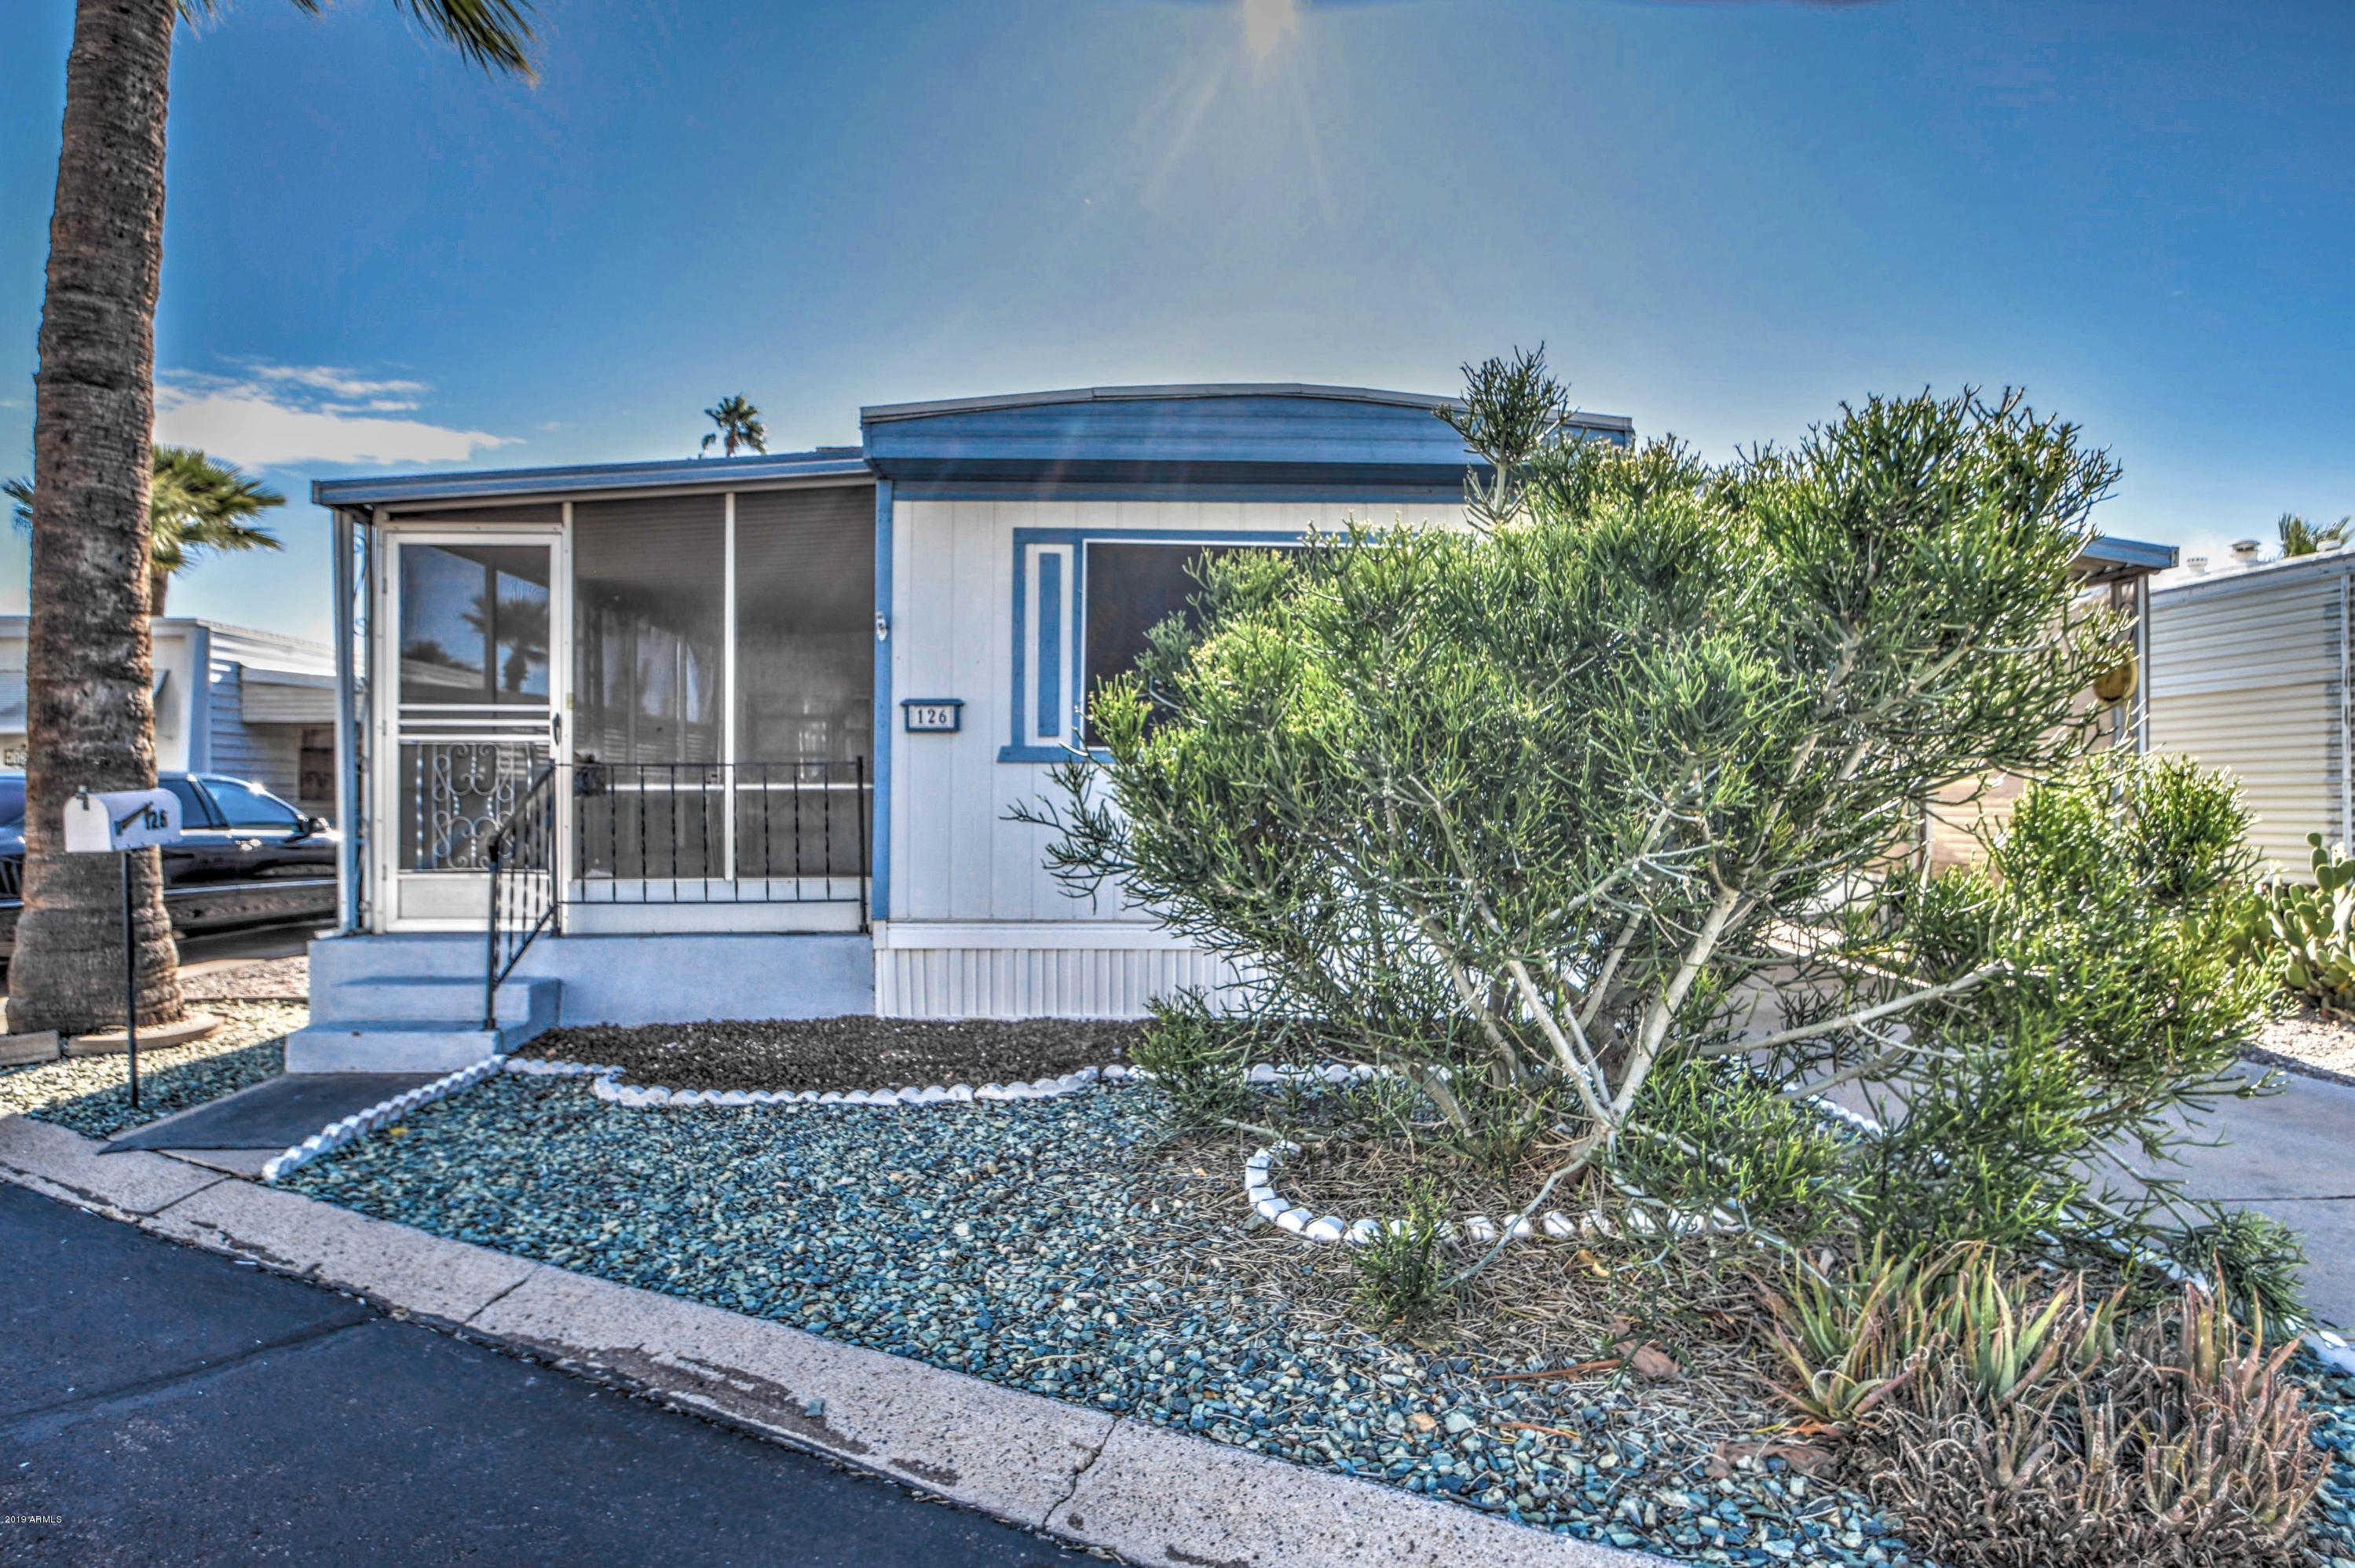 $15,900 - 2Br/1Ba -  for Sale in Riviera Mobile Home Park, Scottsdale